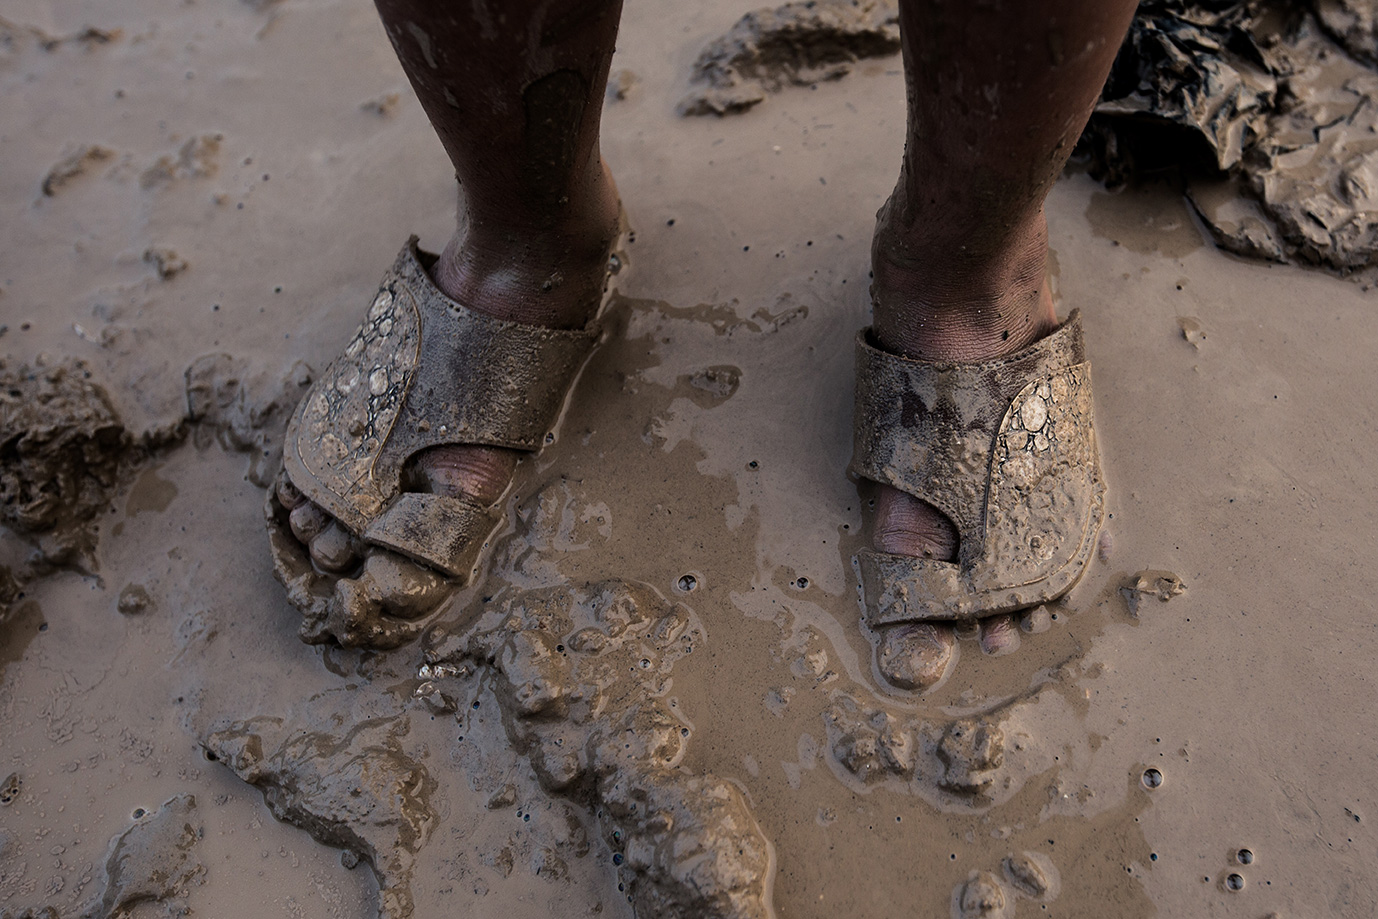 08_foot-mud-rain-refugee-camp-iraq